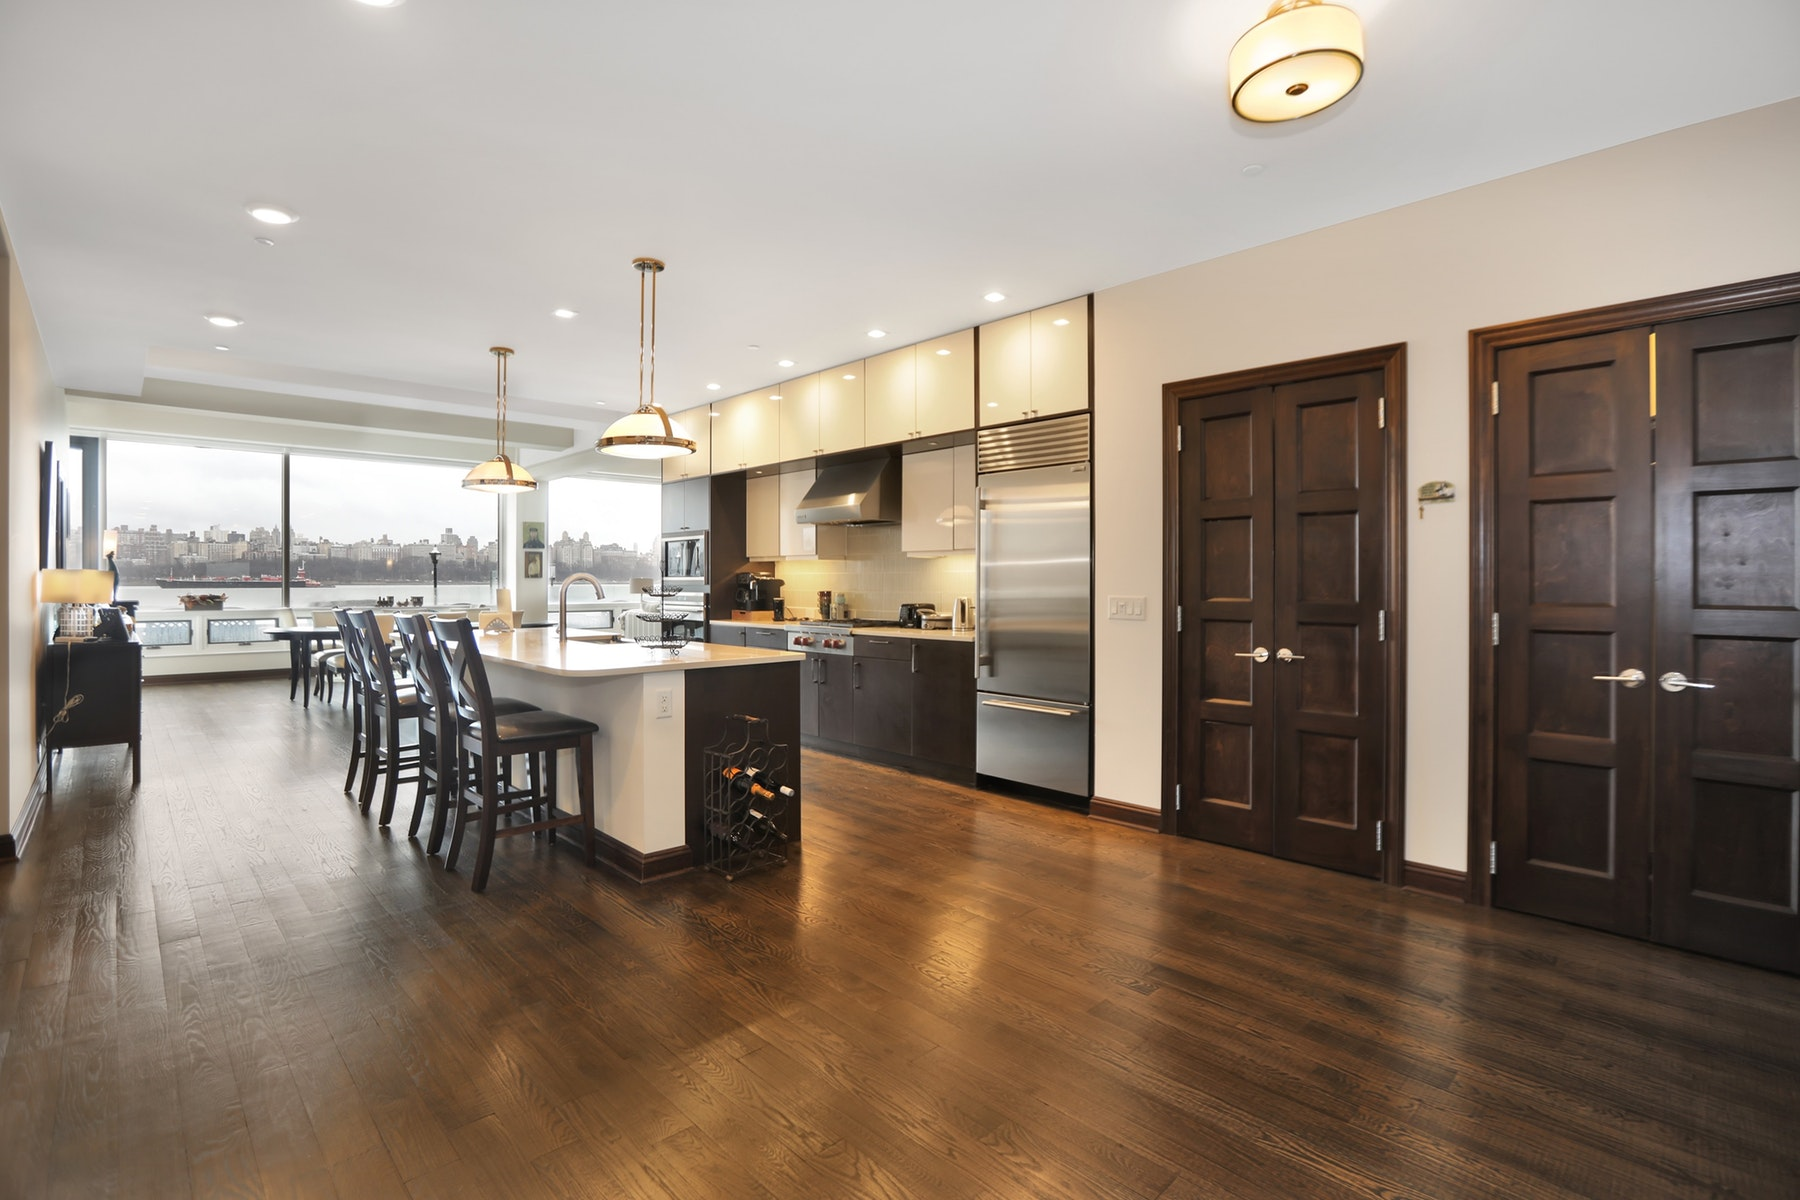 Condominiums vì Bán tại The Pearl 9 Somerset Lane #108-109, Edgewater, New Jersey 07020 Hoa Kỳ